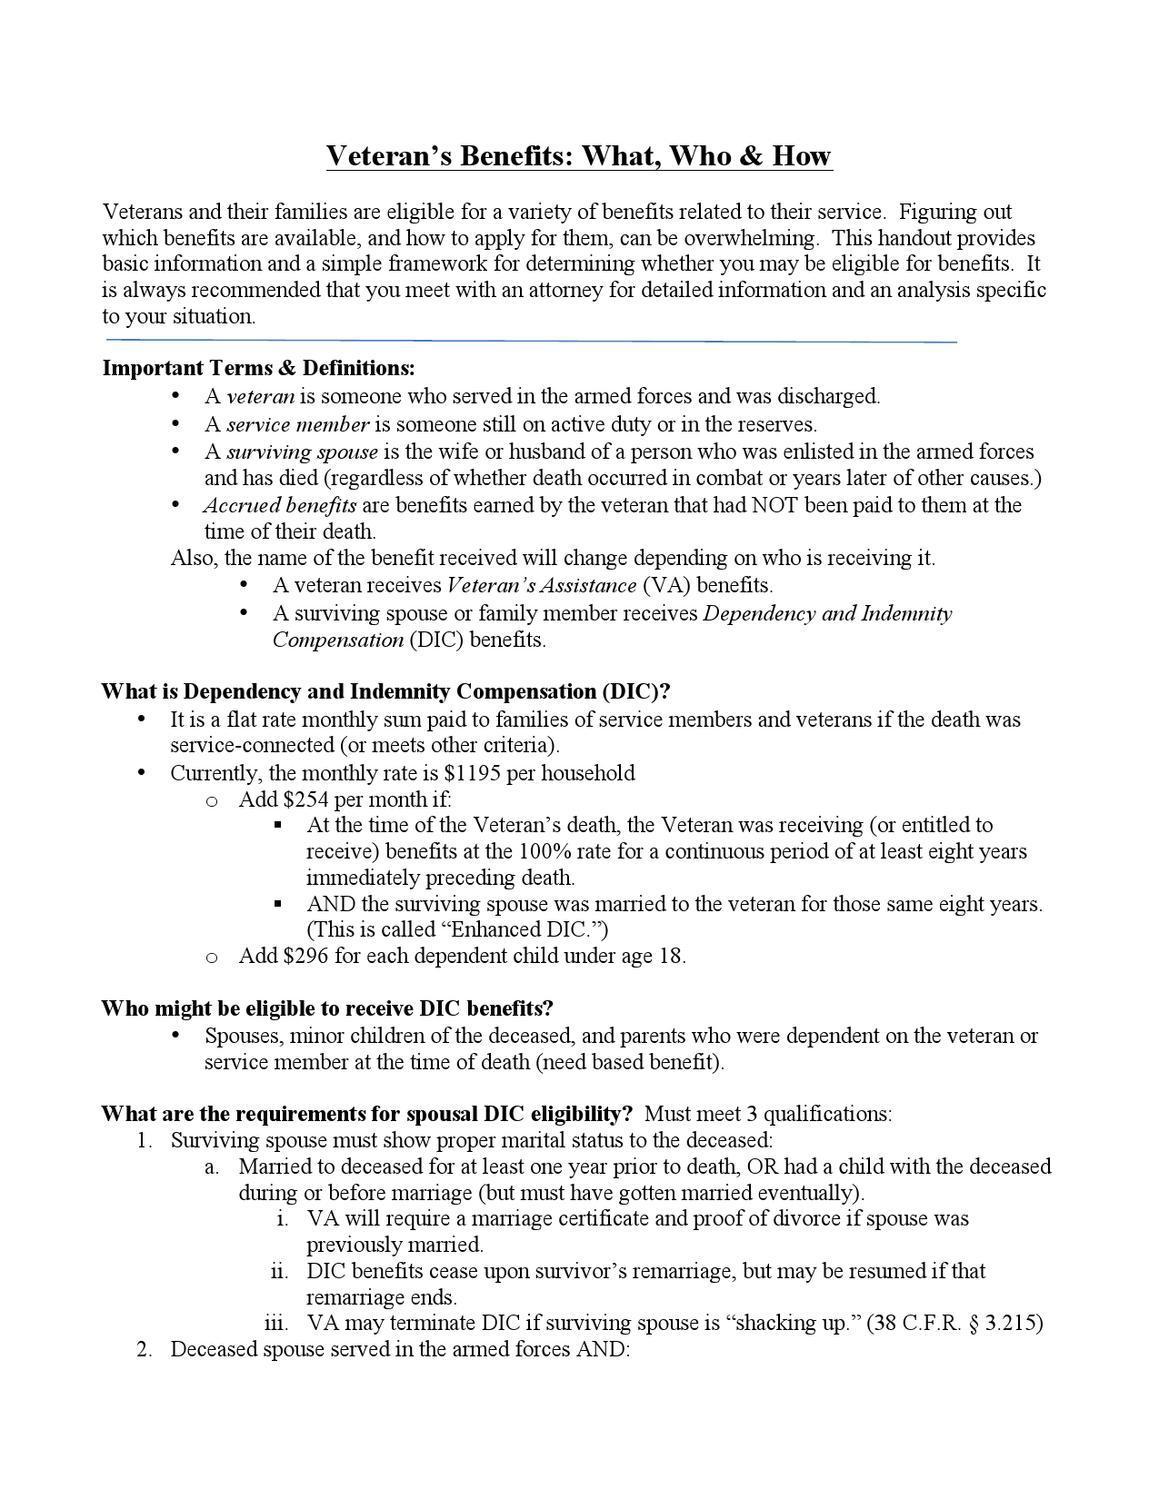 Veteran Assistance & DIC Benefits - FAQs by UT LSS - issuu